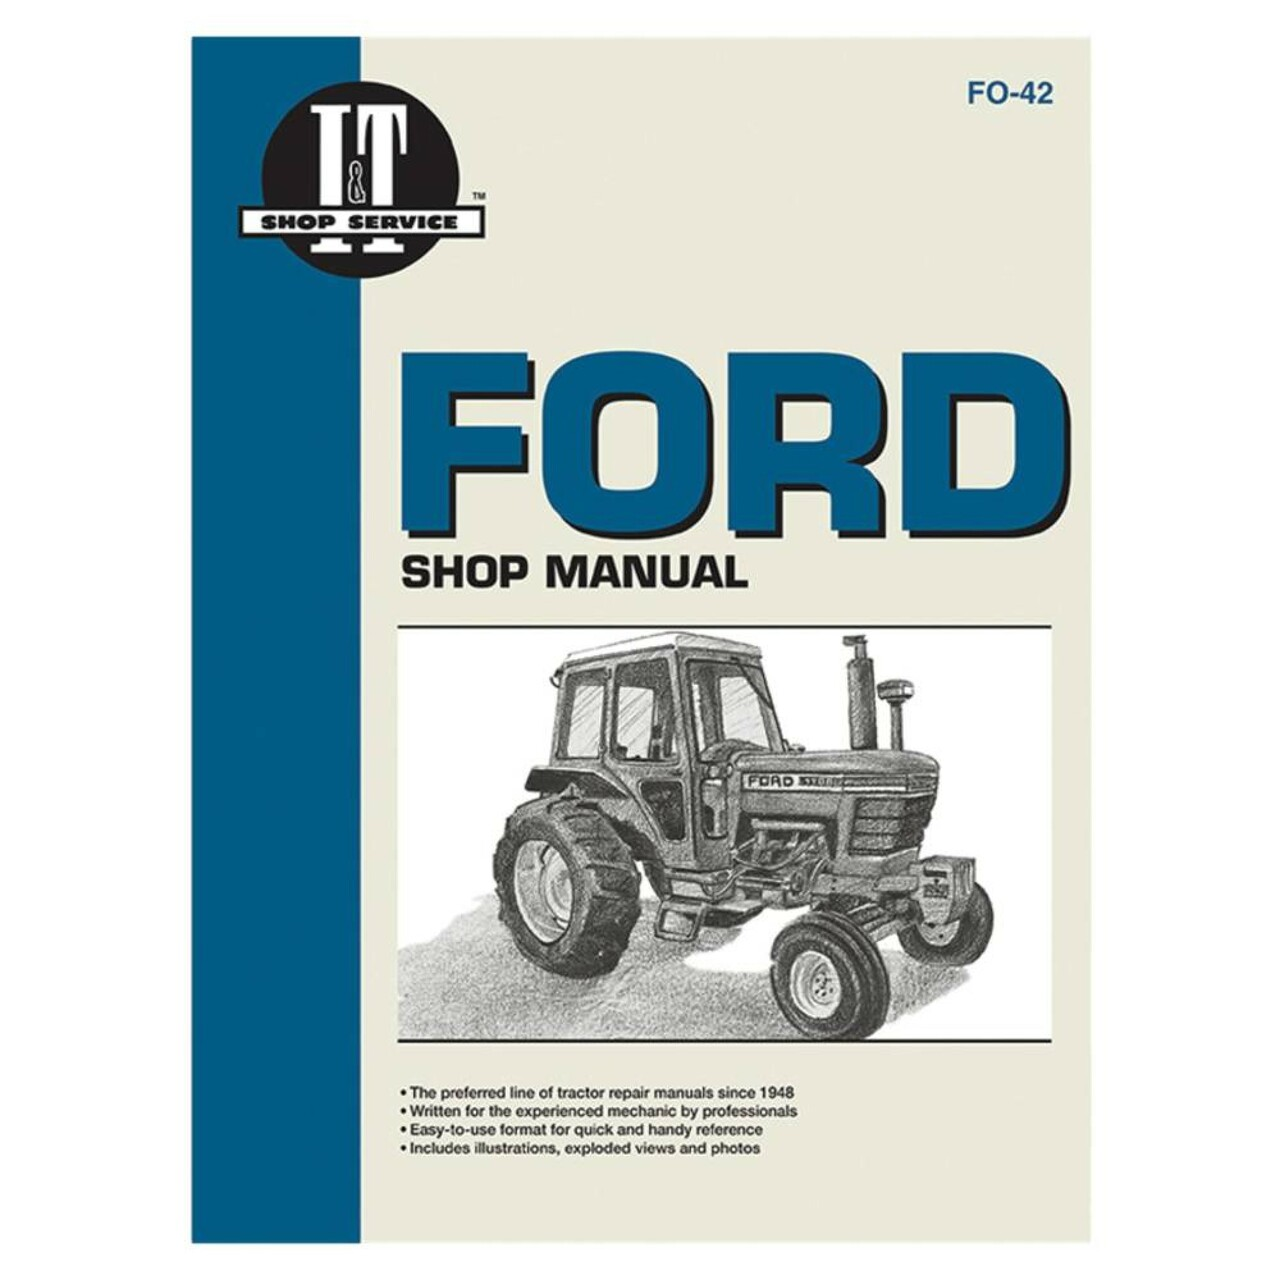 service manual ford new holland tractor fo 42 5100 5200 5600 5610d3d71ba2asa5oz cloudfront [ 1280 x 1280 Pixel ]